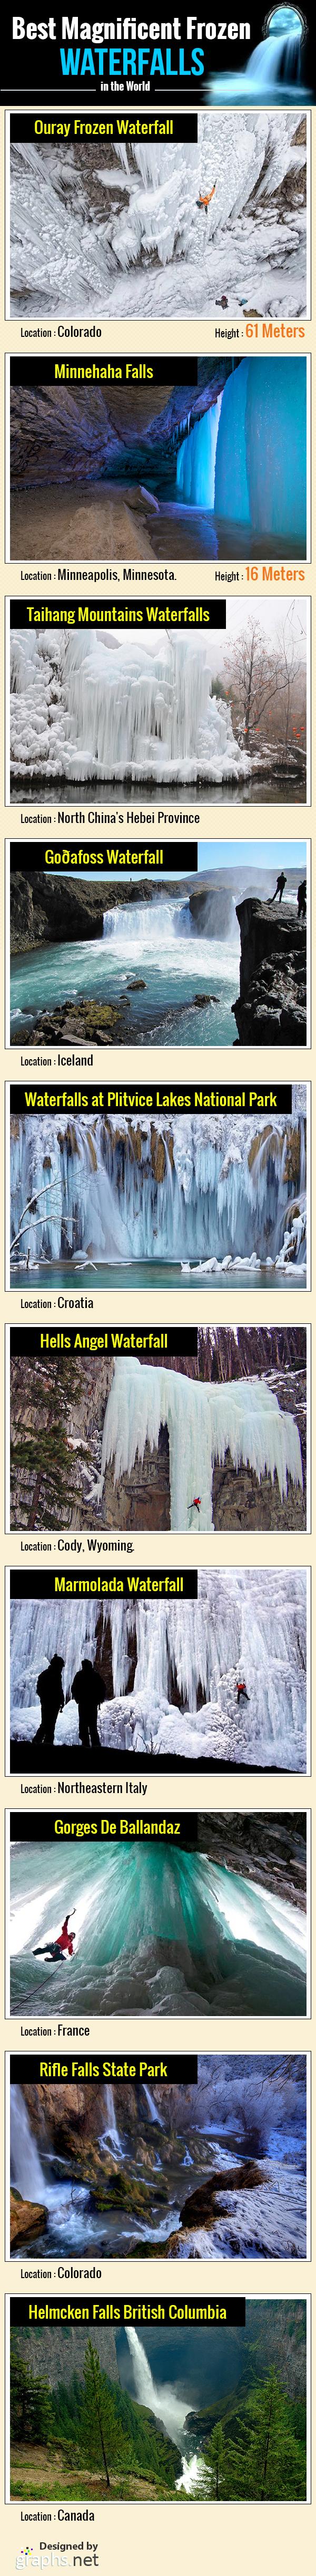 Best Magnificent Frozen Waterfalls in the World